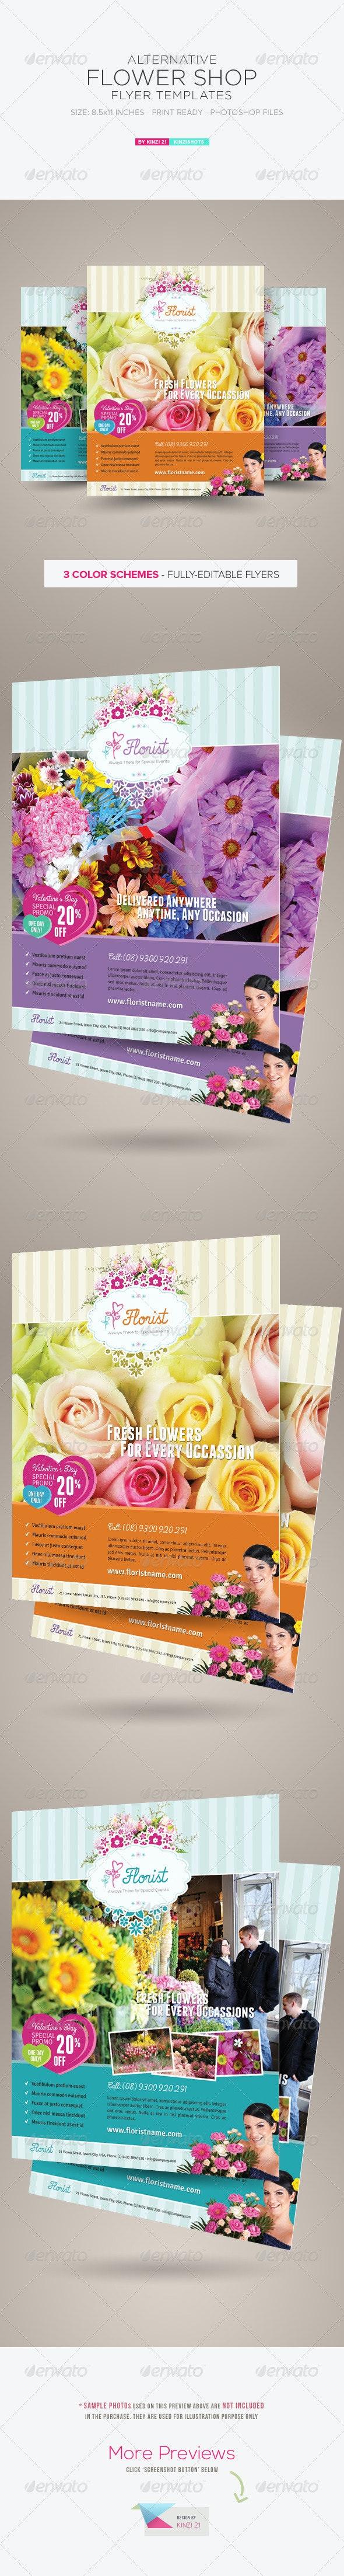 Alternative Flower Shop Flyer Templates - Corporate Flyers